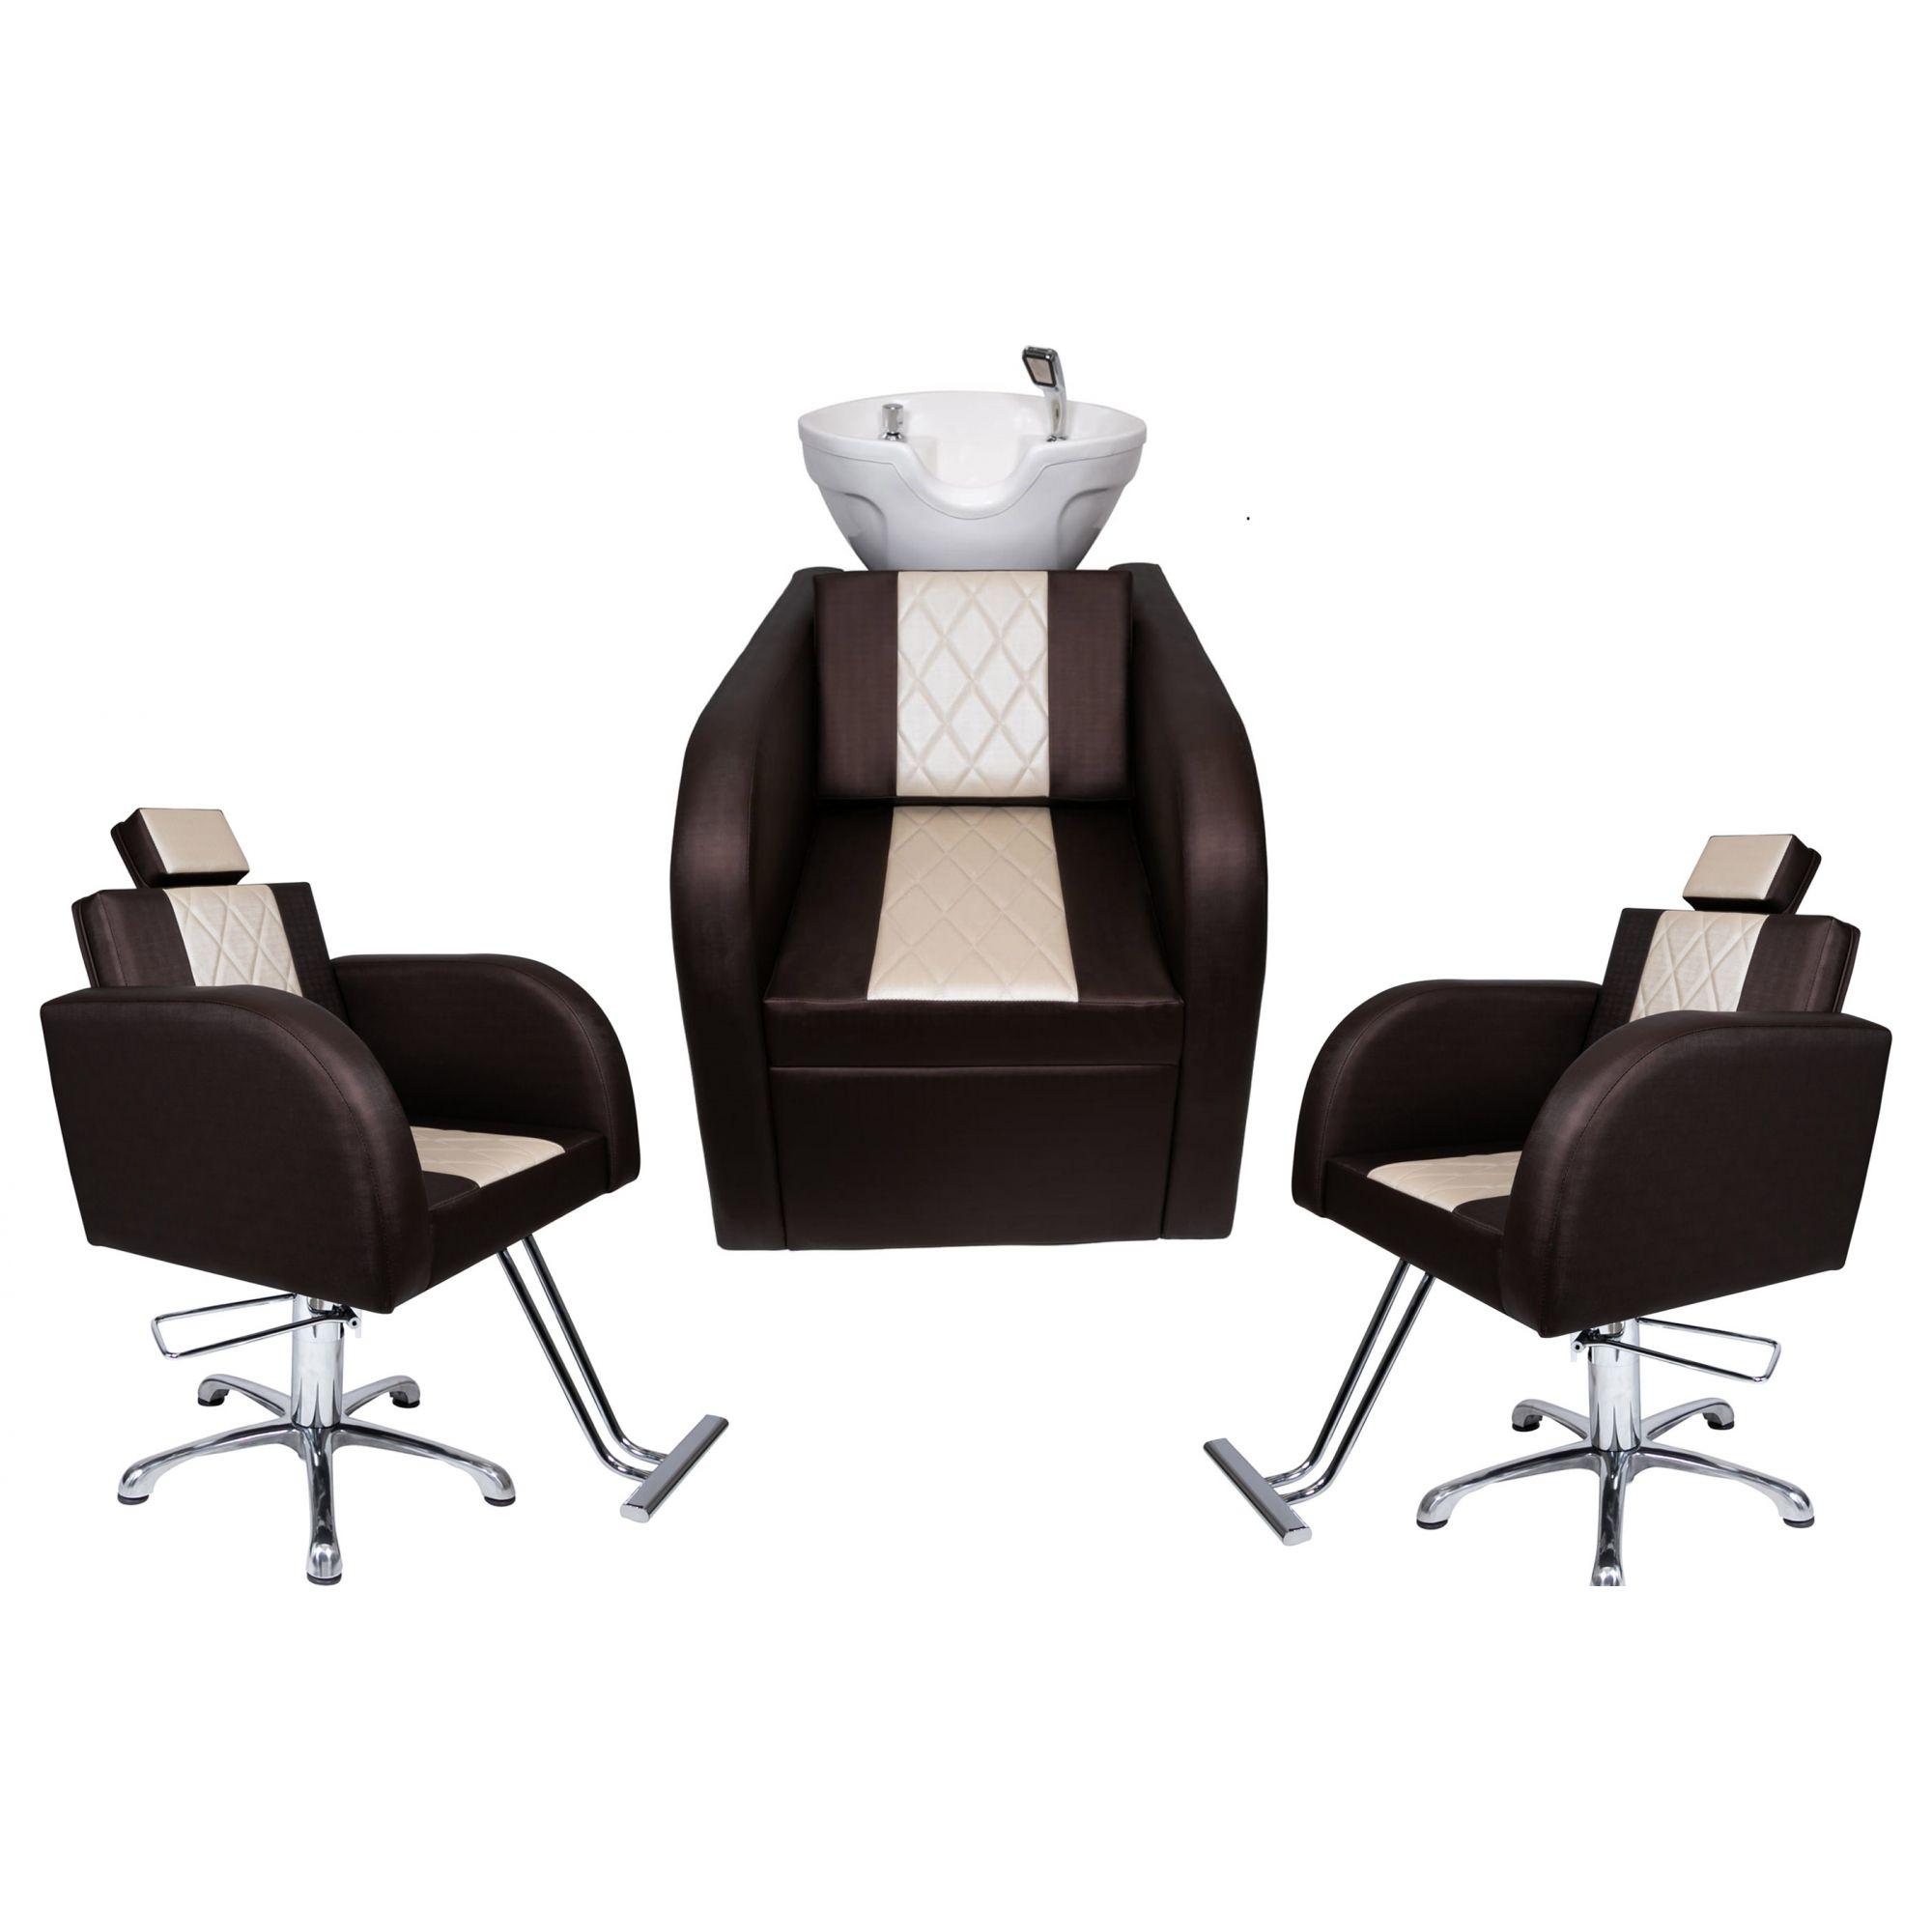 Lavatório Stilo Fibra Branca Bege/Marrom + 2 Cadeiras Stilo Fixa